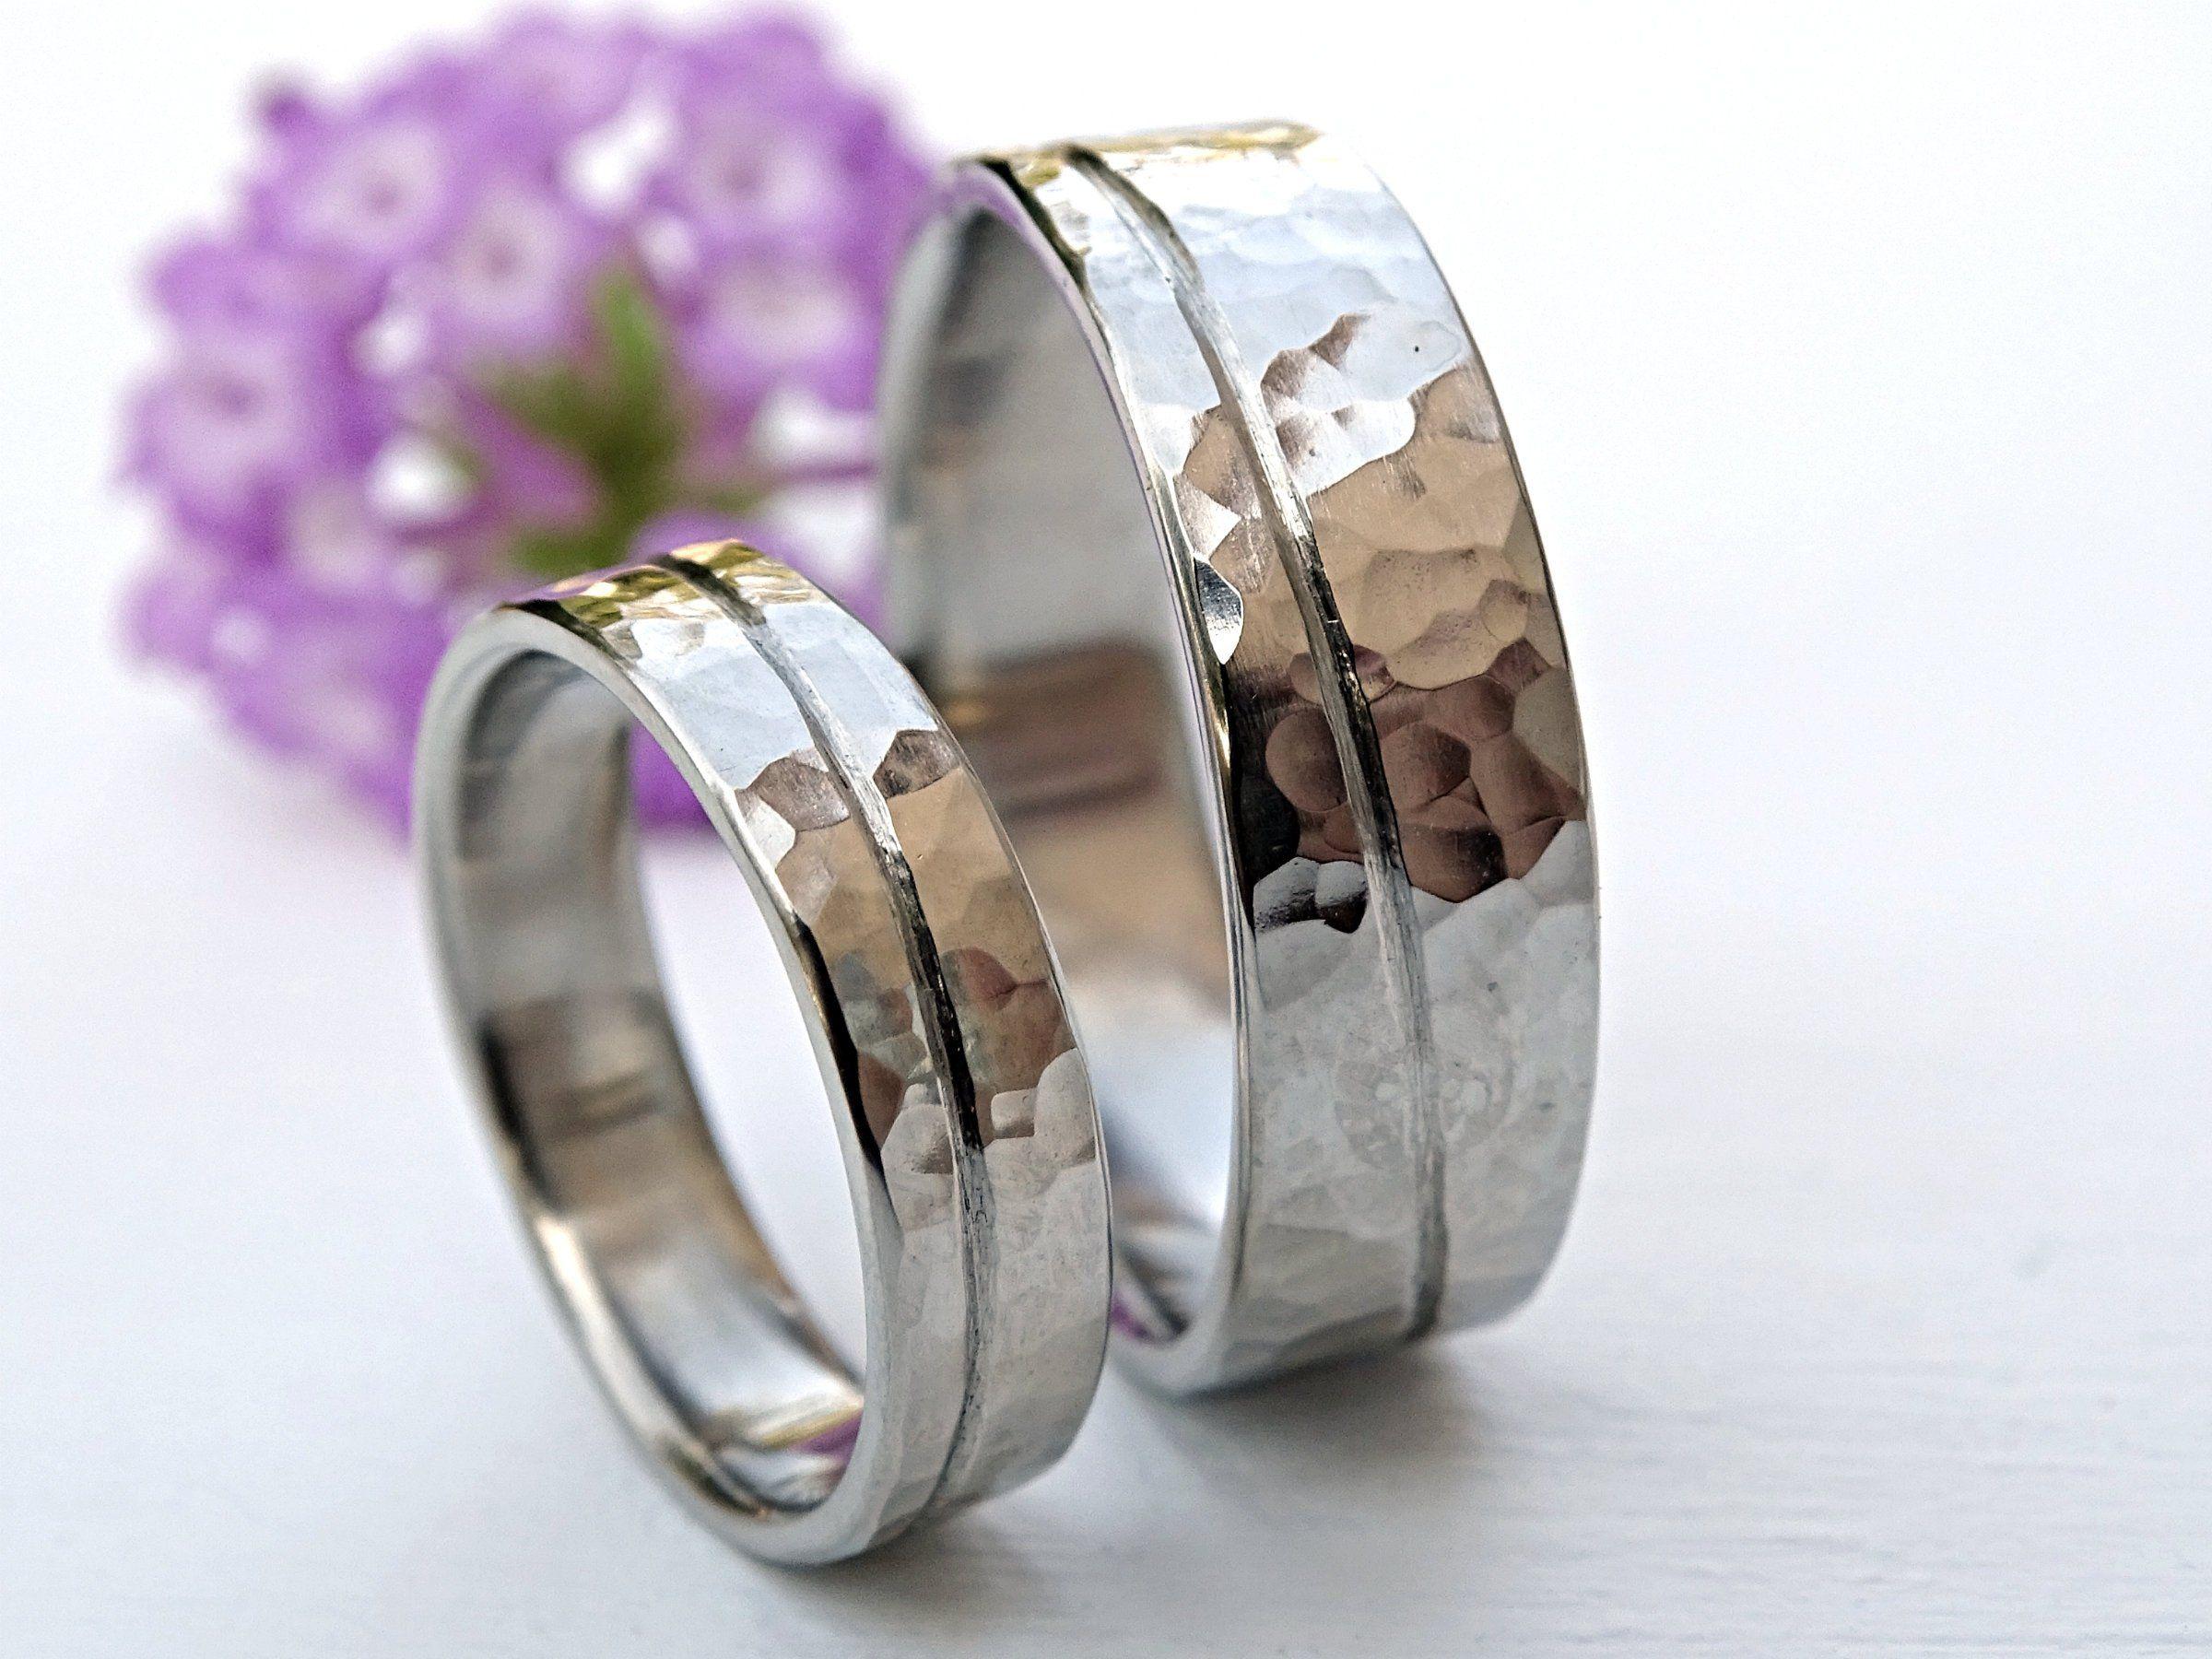 Gold Wedding Ring Set White Gold Wedding Bands Matching Etsy Matching Wedding Rings Wedding Rings Sets Gold Gold Wedding Rings